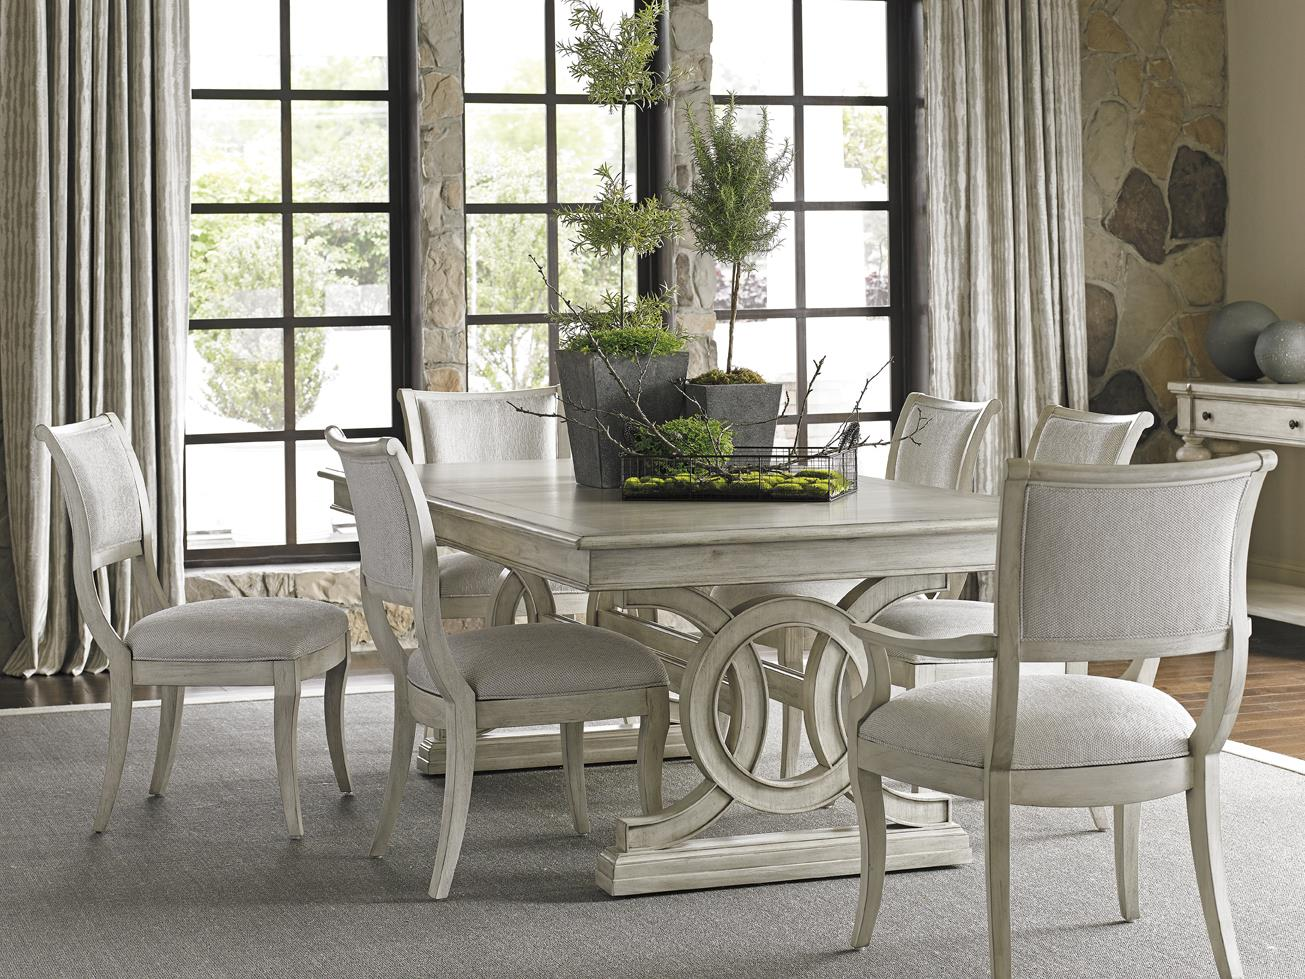 Oyster bay 714 by lexington hudsons furniture lexington oyster bay dealer